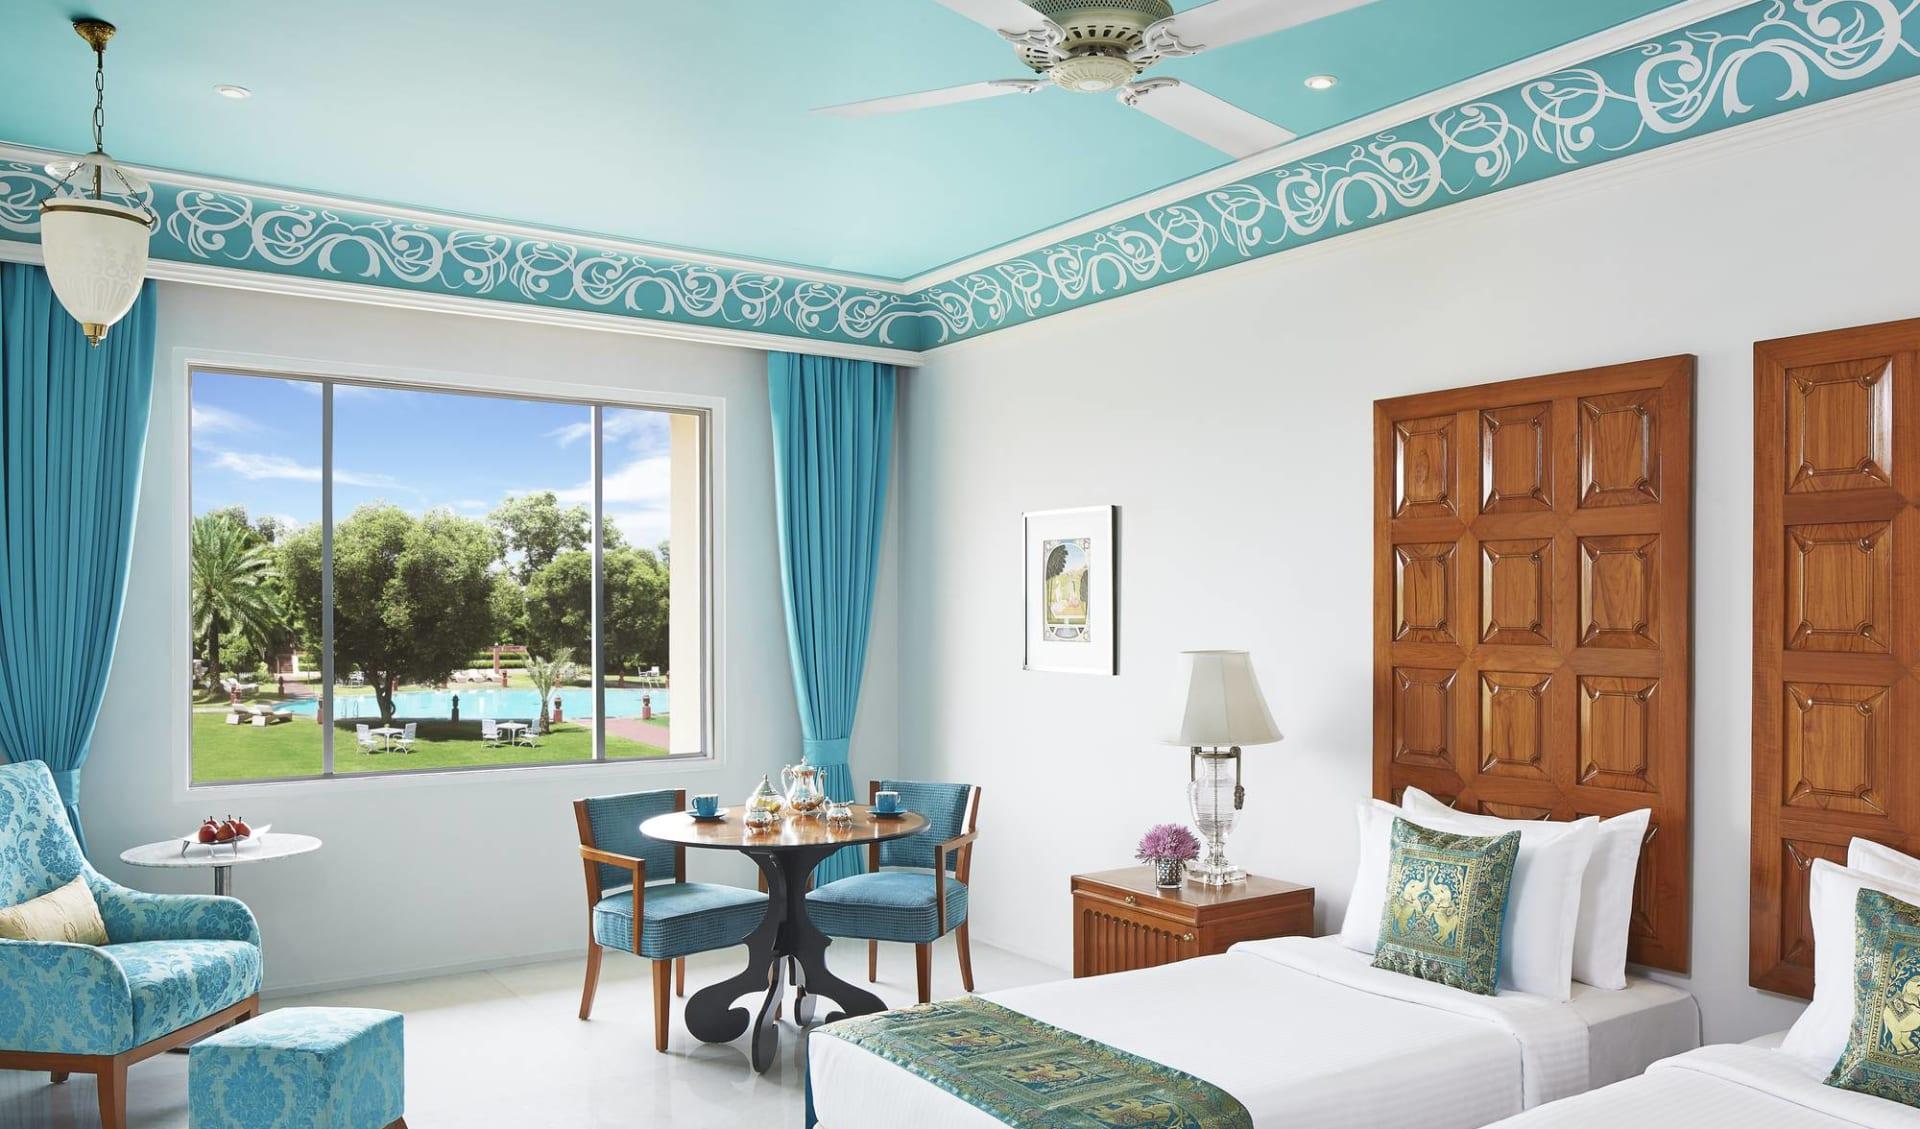 Jai Mahal Palace in Jaipur: Luxury